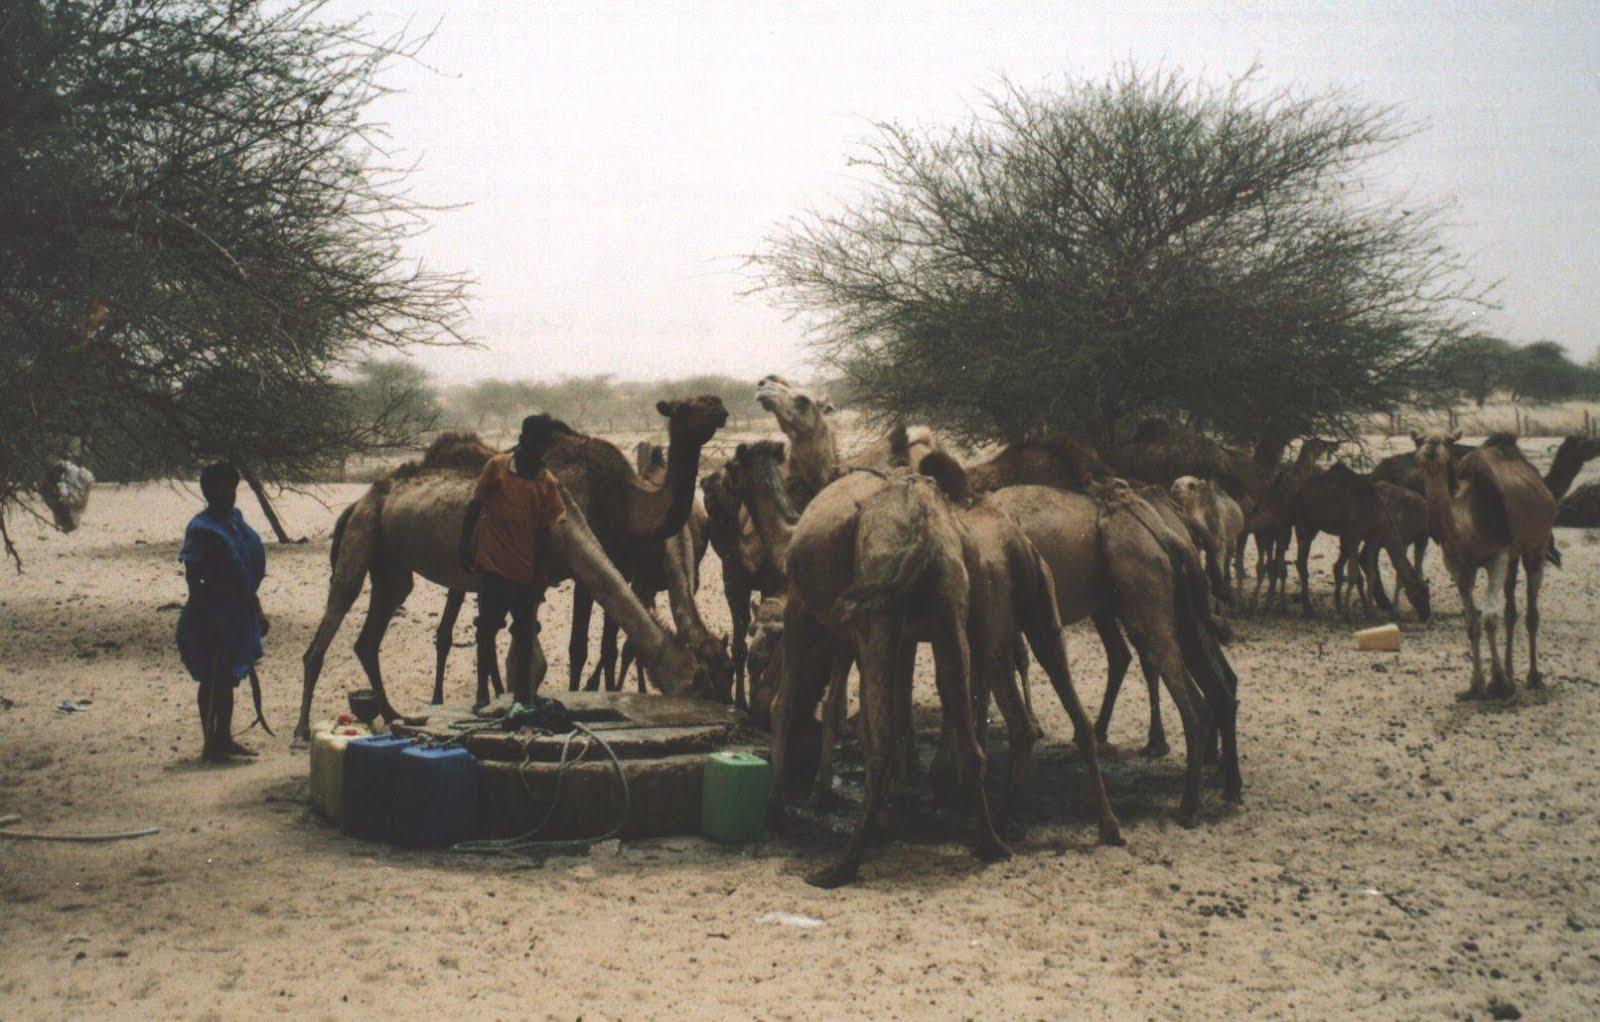 2002. El Sahel (Mauritania)